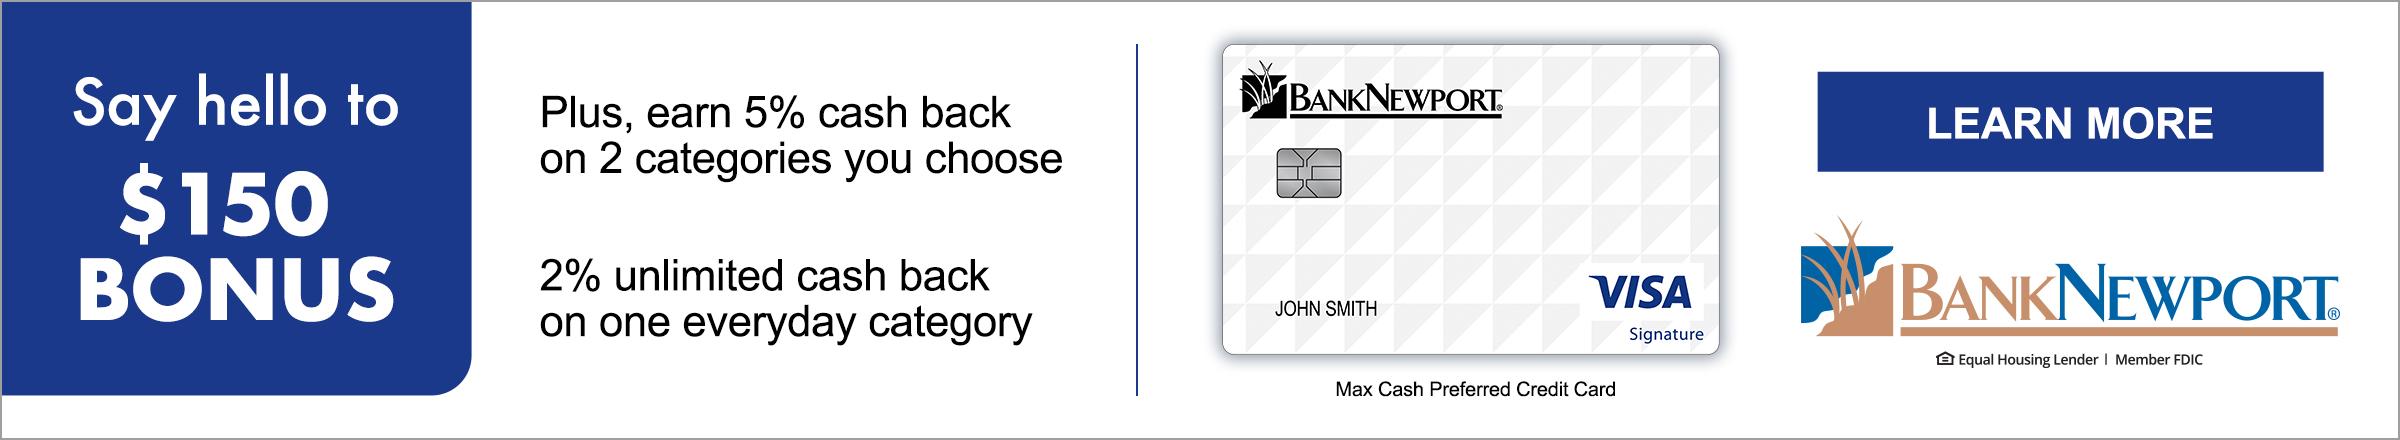 bnp20503-credit-card-promo-banner-ad-2400x440-r1